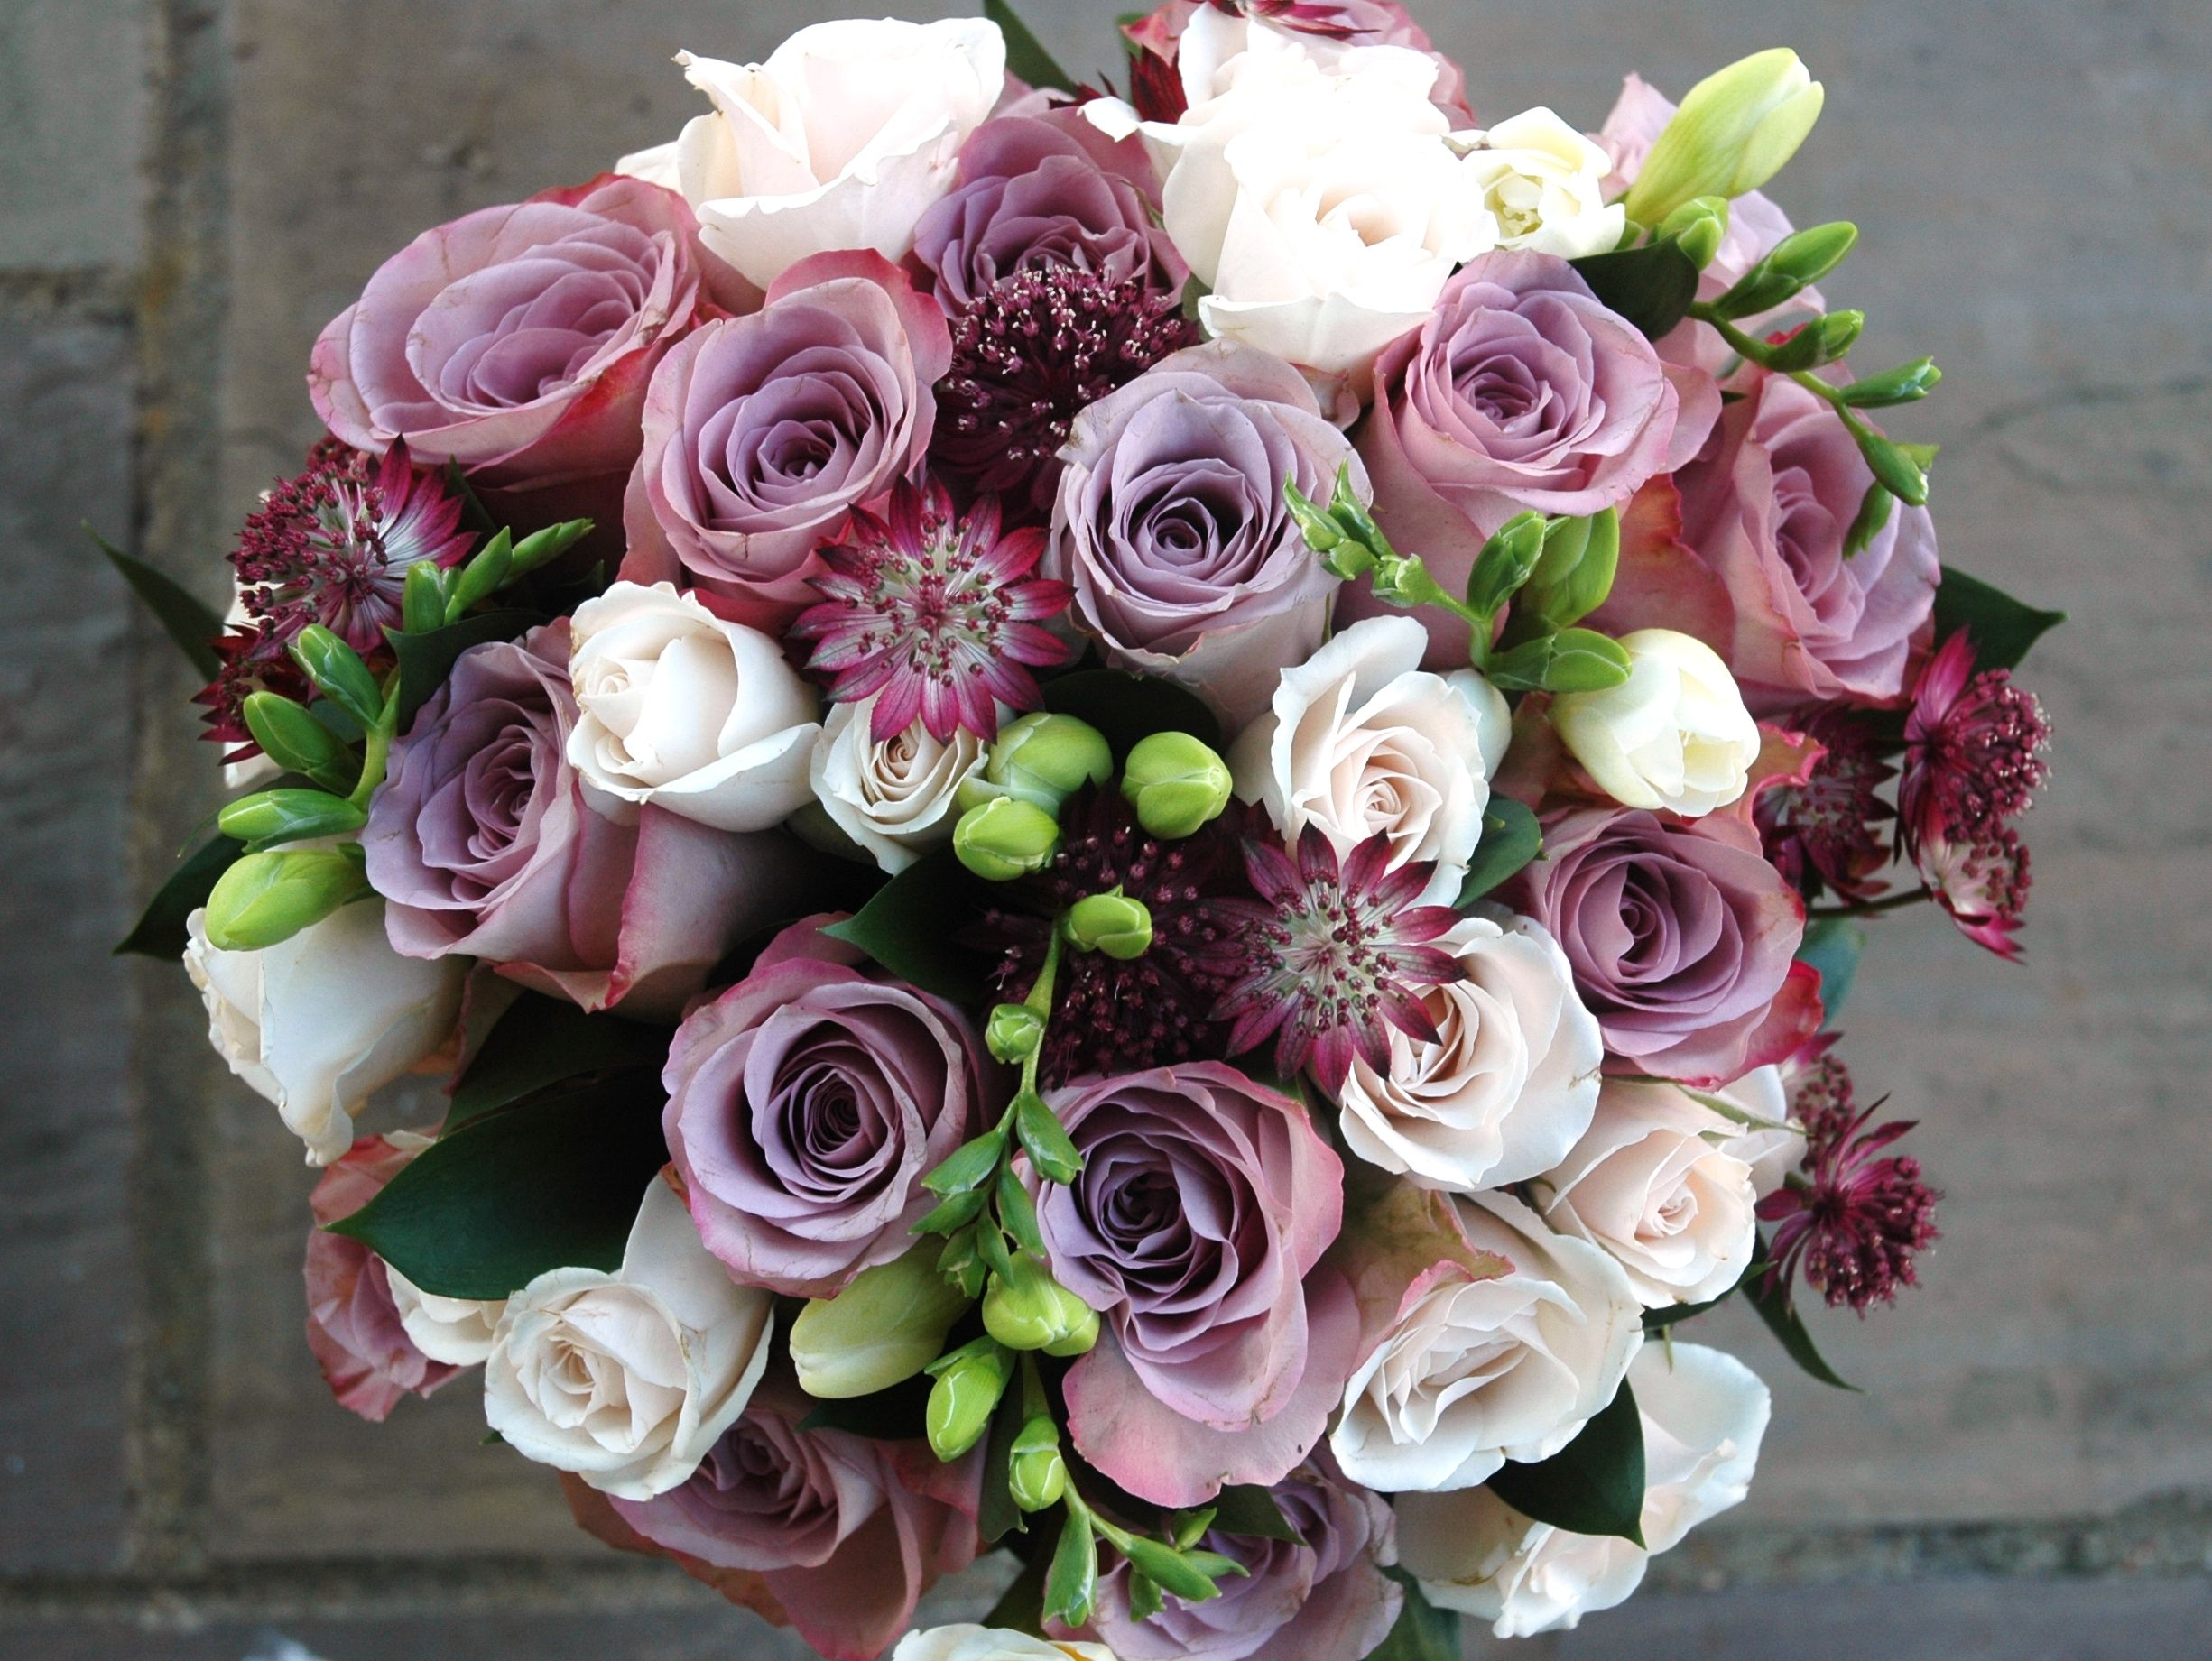 Memory lane roses freesia astrantia vintage bouquet buchete memory lane roses freesia astrantia vintage bouquet bridal flowers winter wedding flowers izmirmasajfo